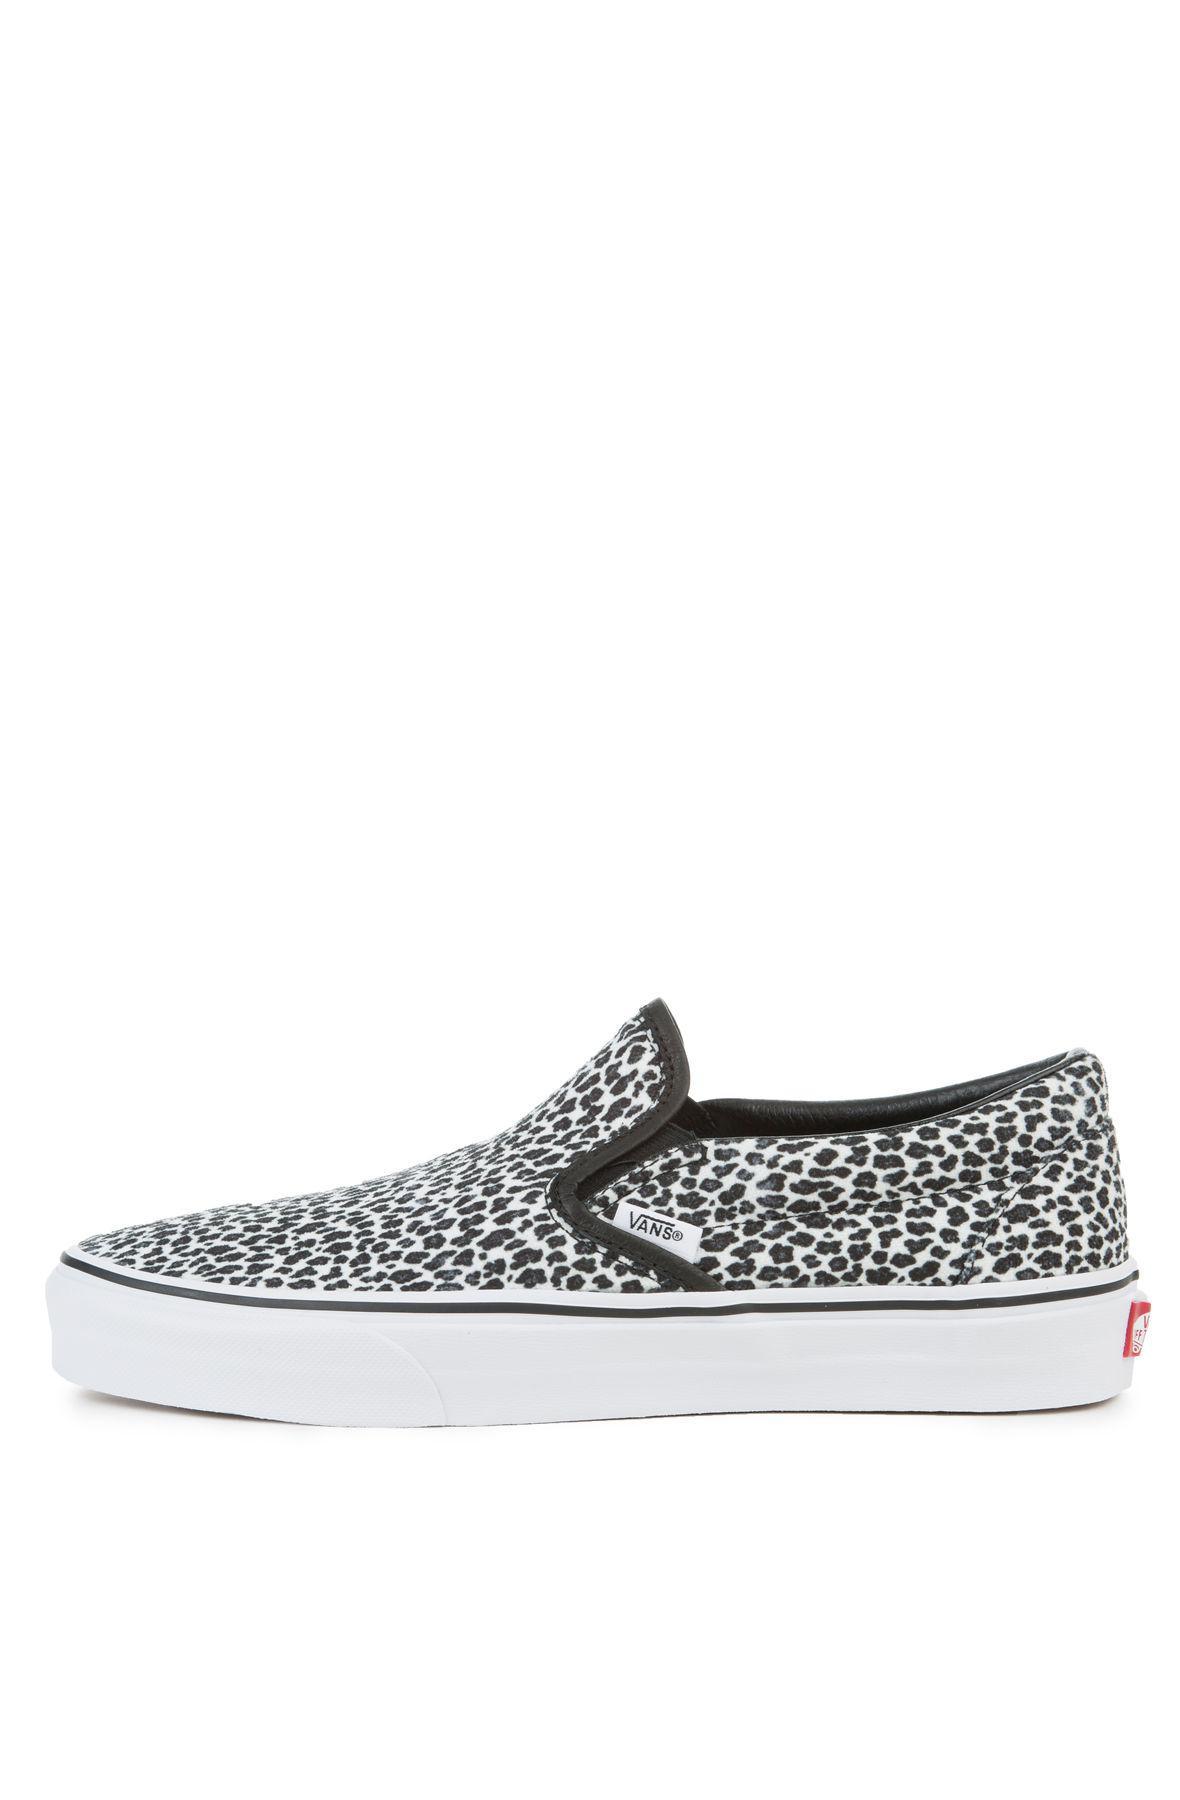 Vans Leopard Digi Slip On